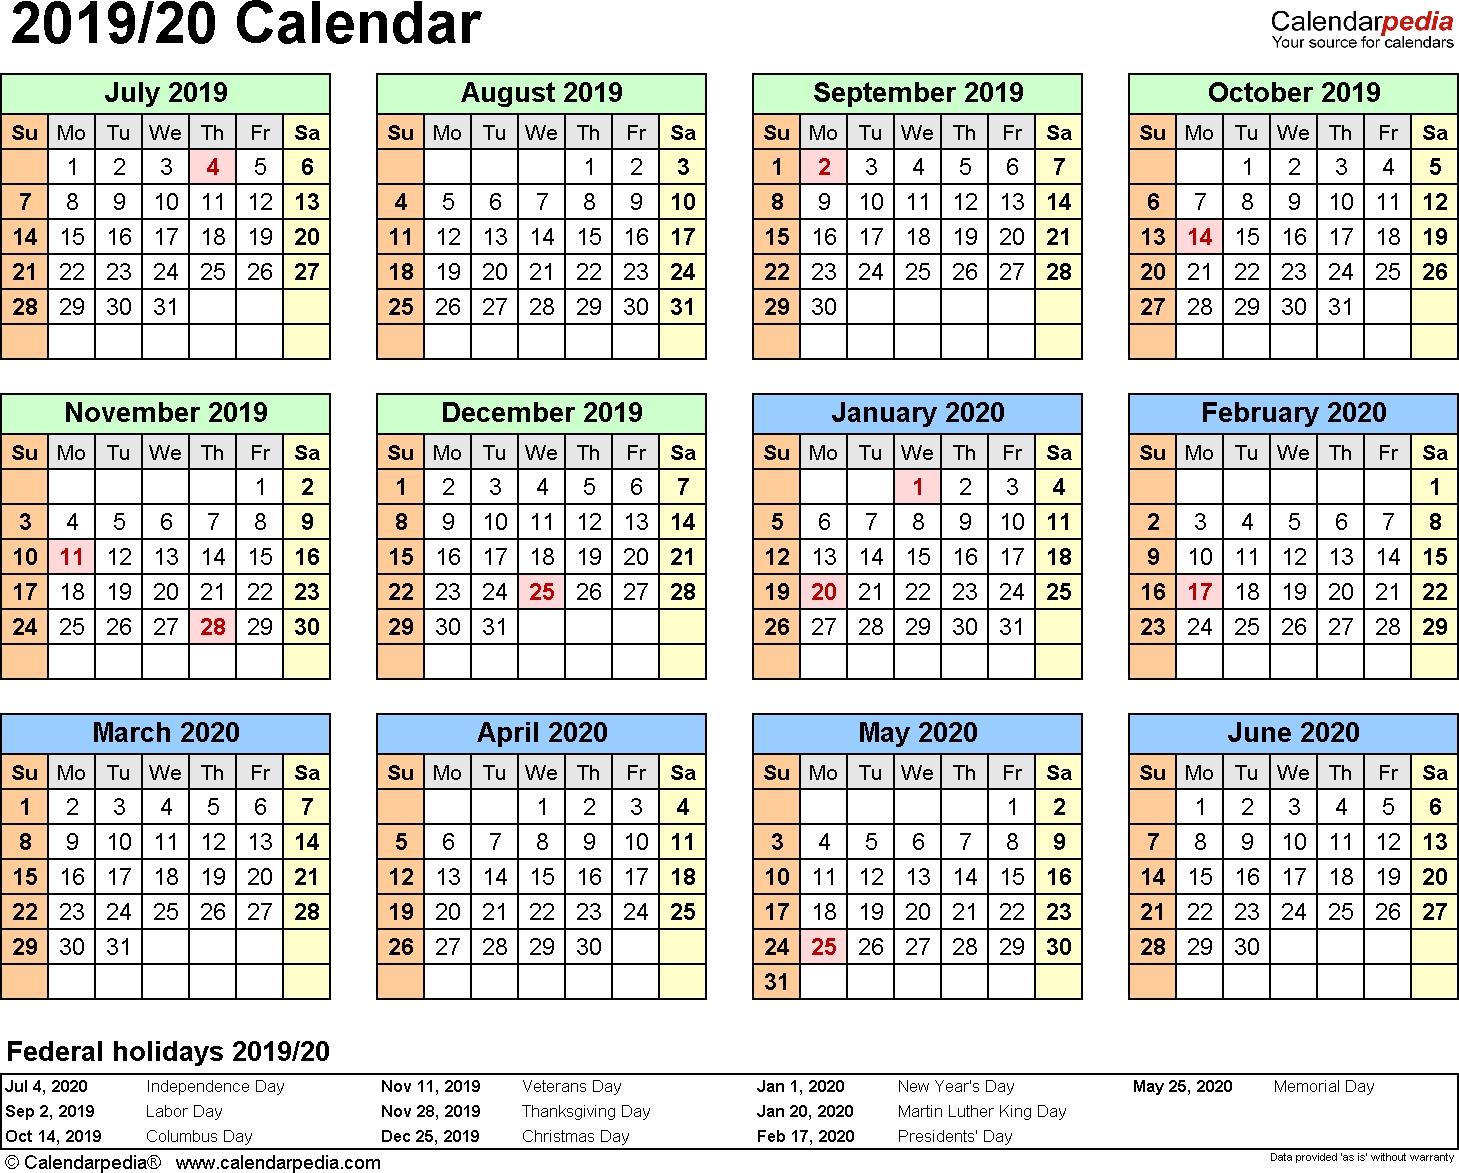 Split Year Calendar 2019/20 (July To June) - Word Templates inside Half Page Calendar Template 2019/2020